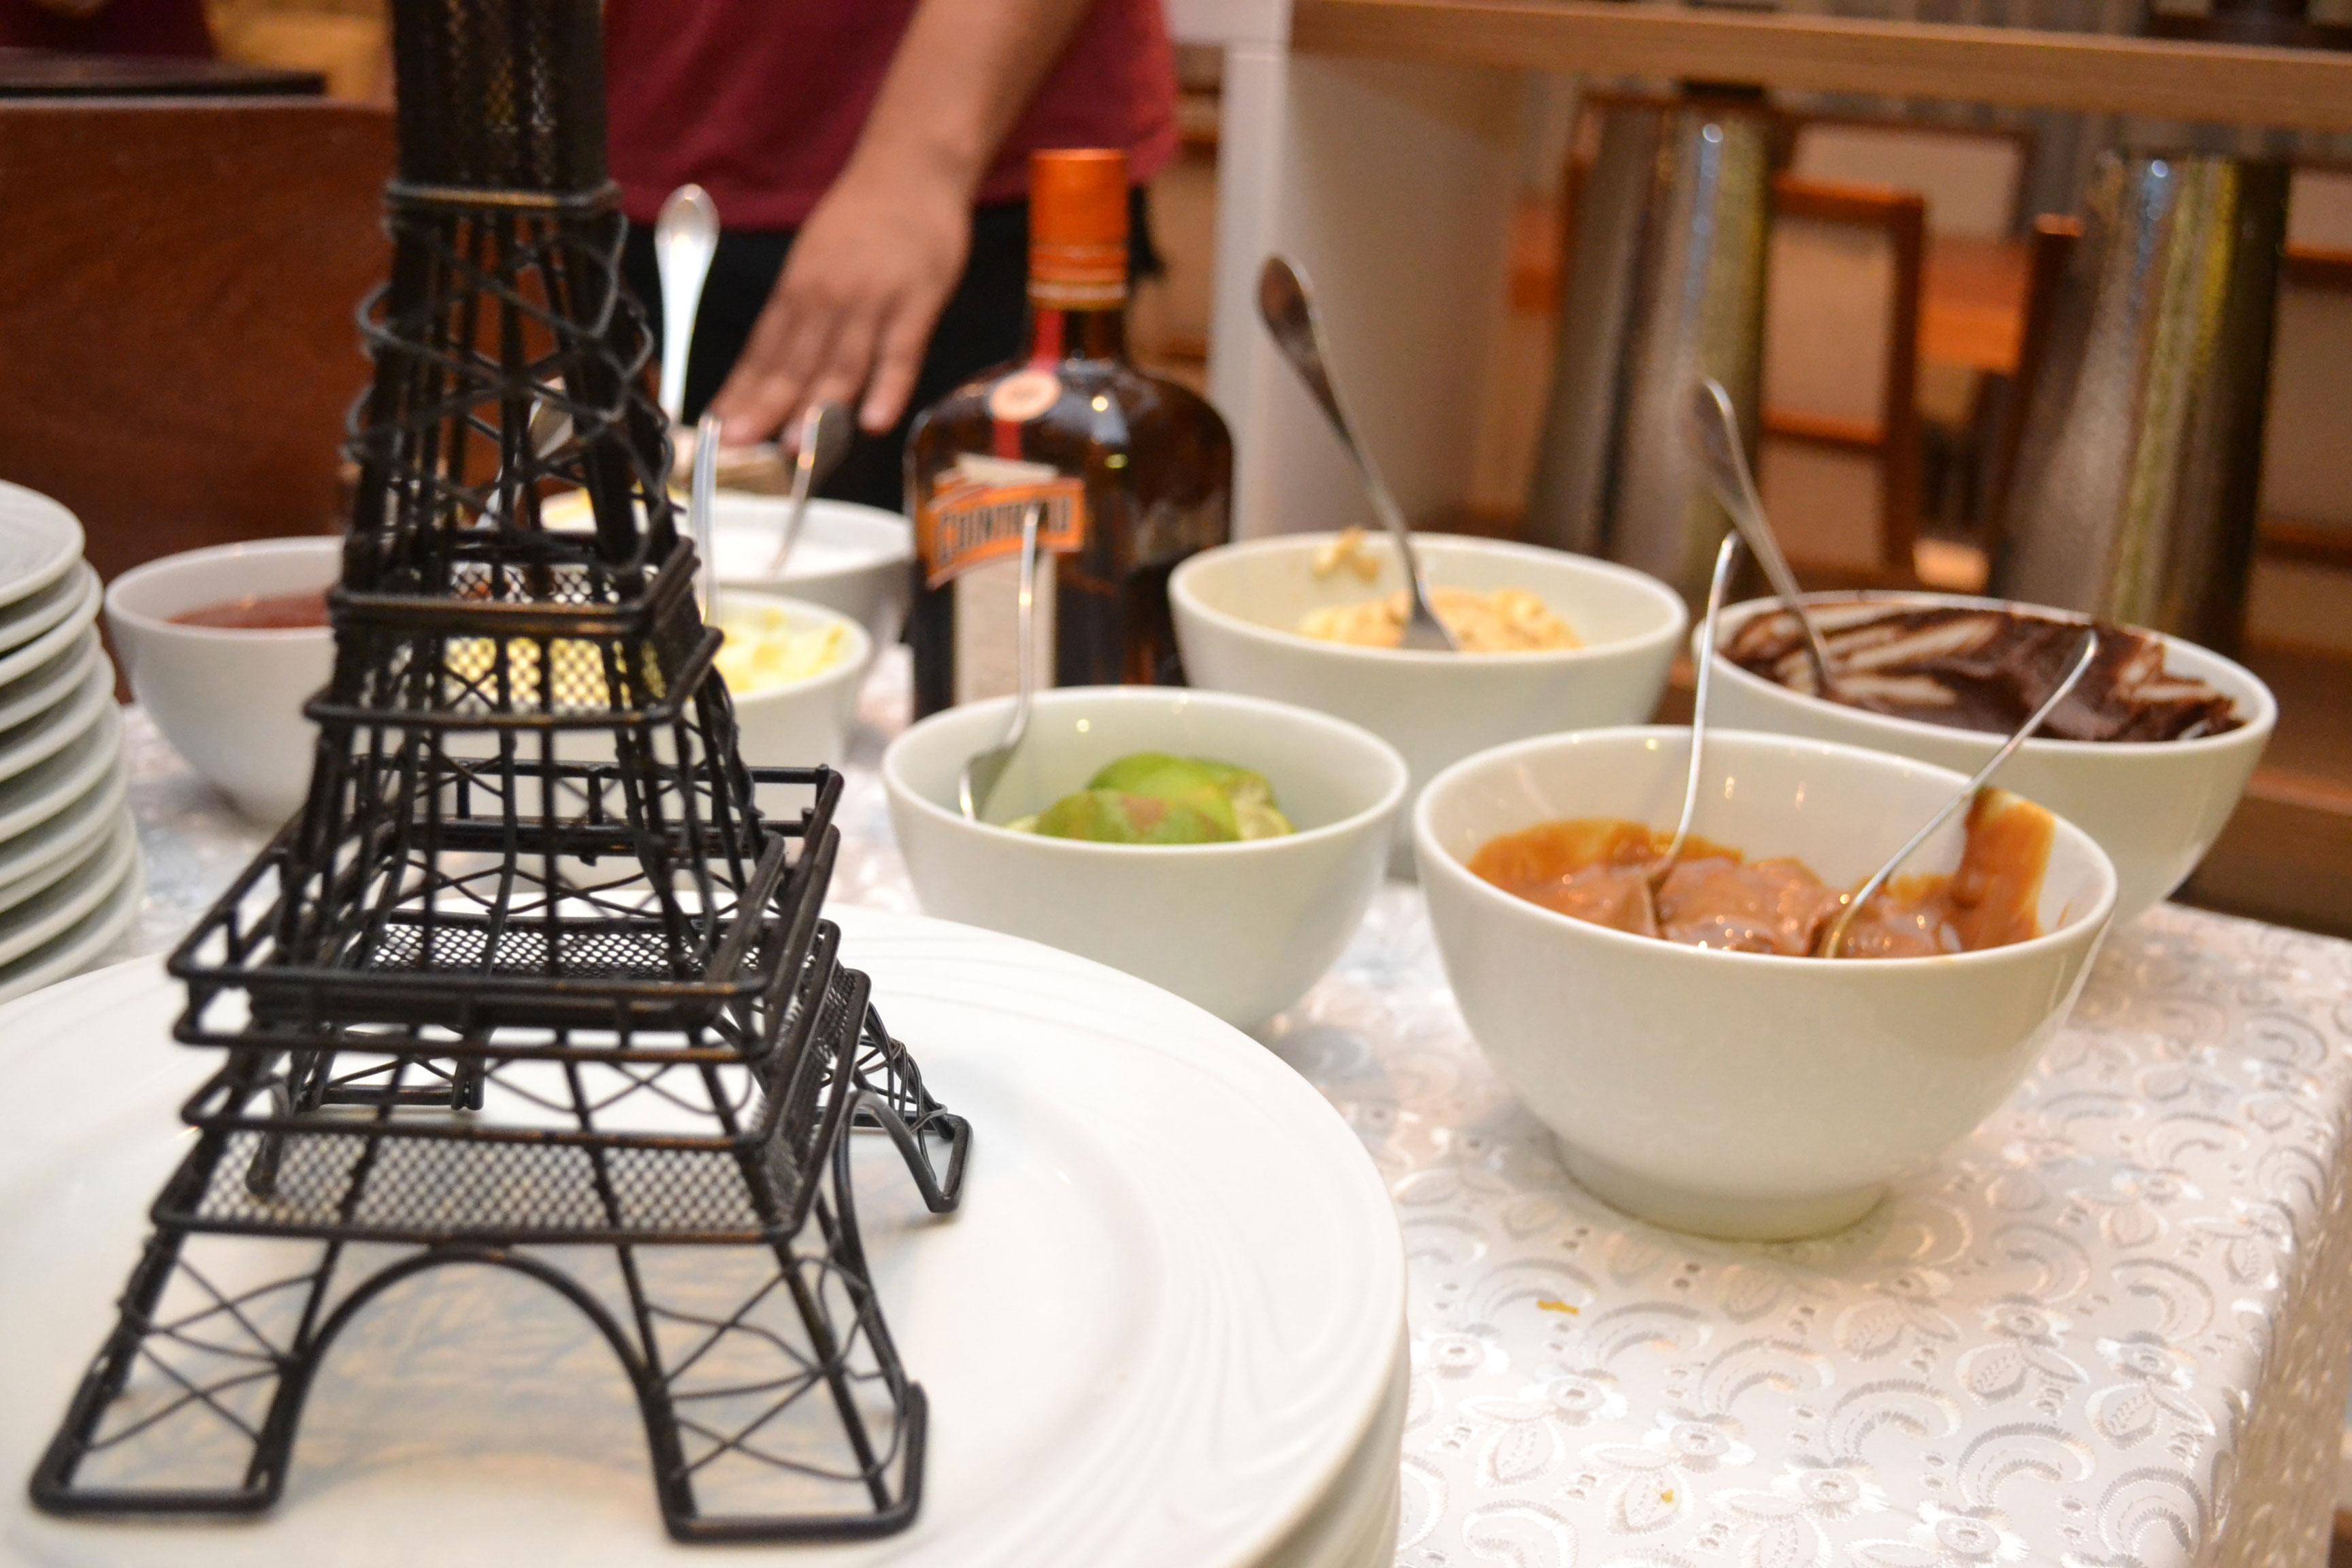 buffet-crepe-crepelafrance-recheios-doces-torre-eiffel